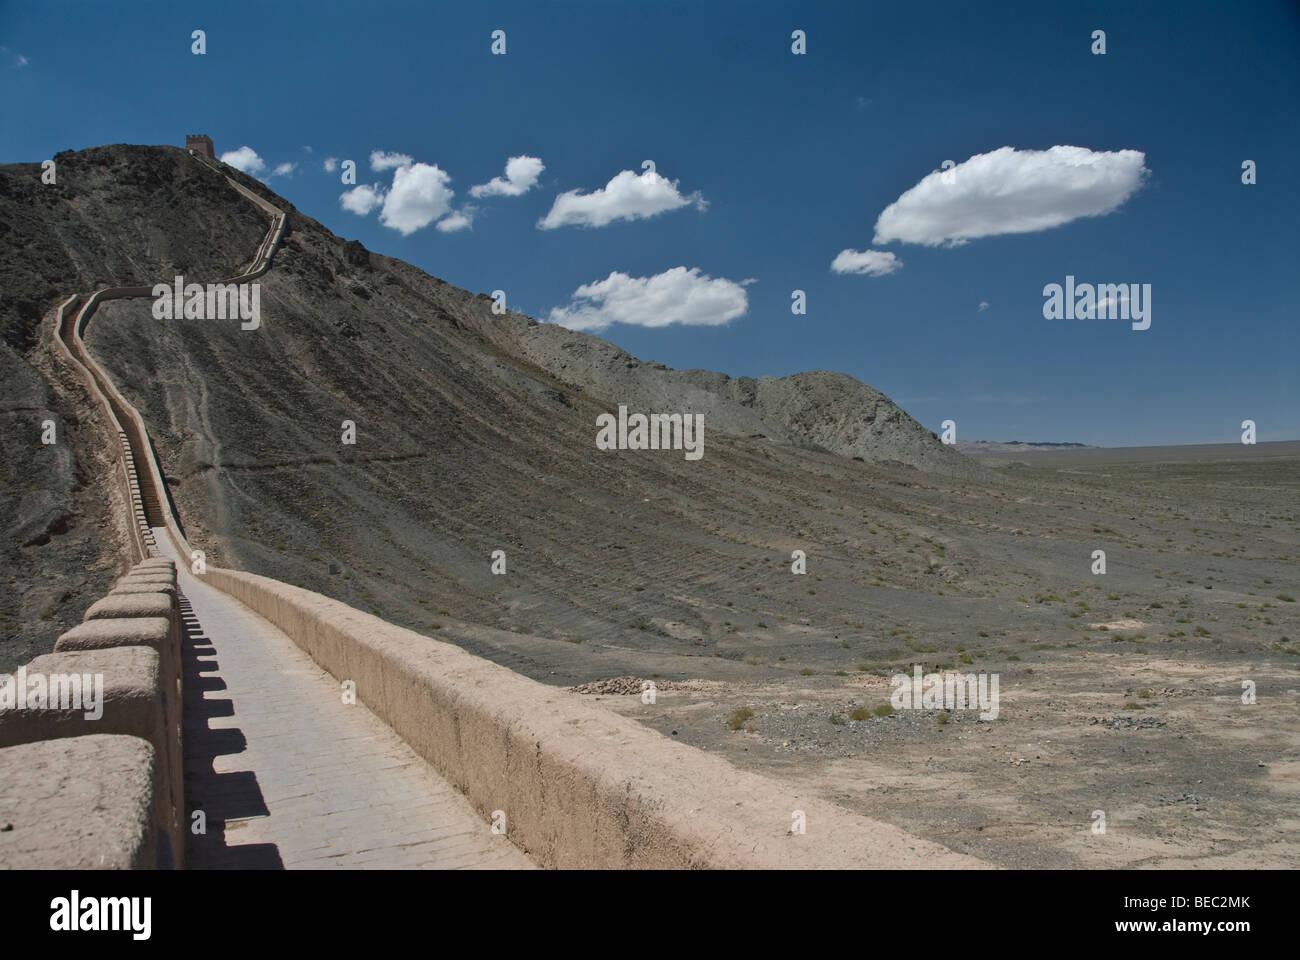 Jiayuguan section of the Great Wall of China. Gansu Province, China 2008. - Stock Image